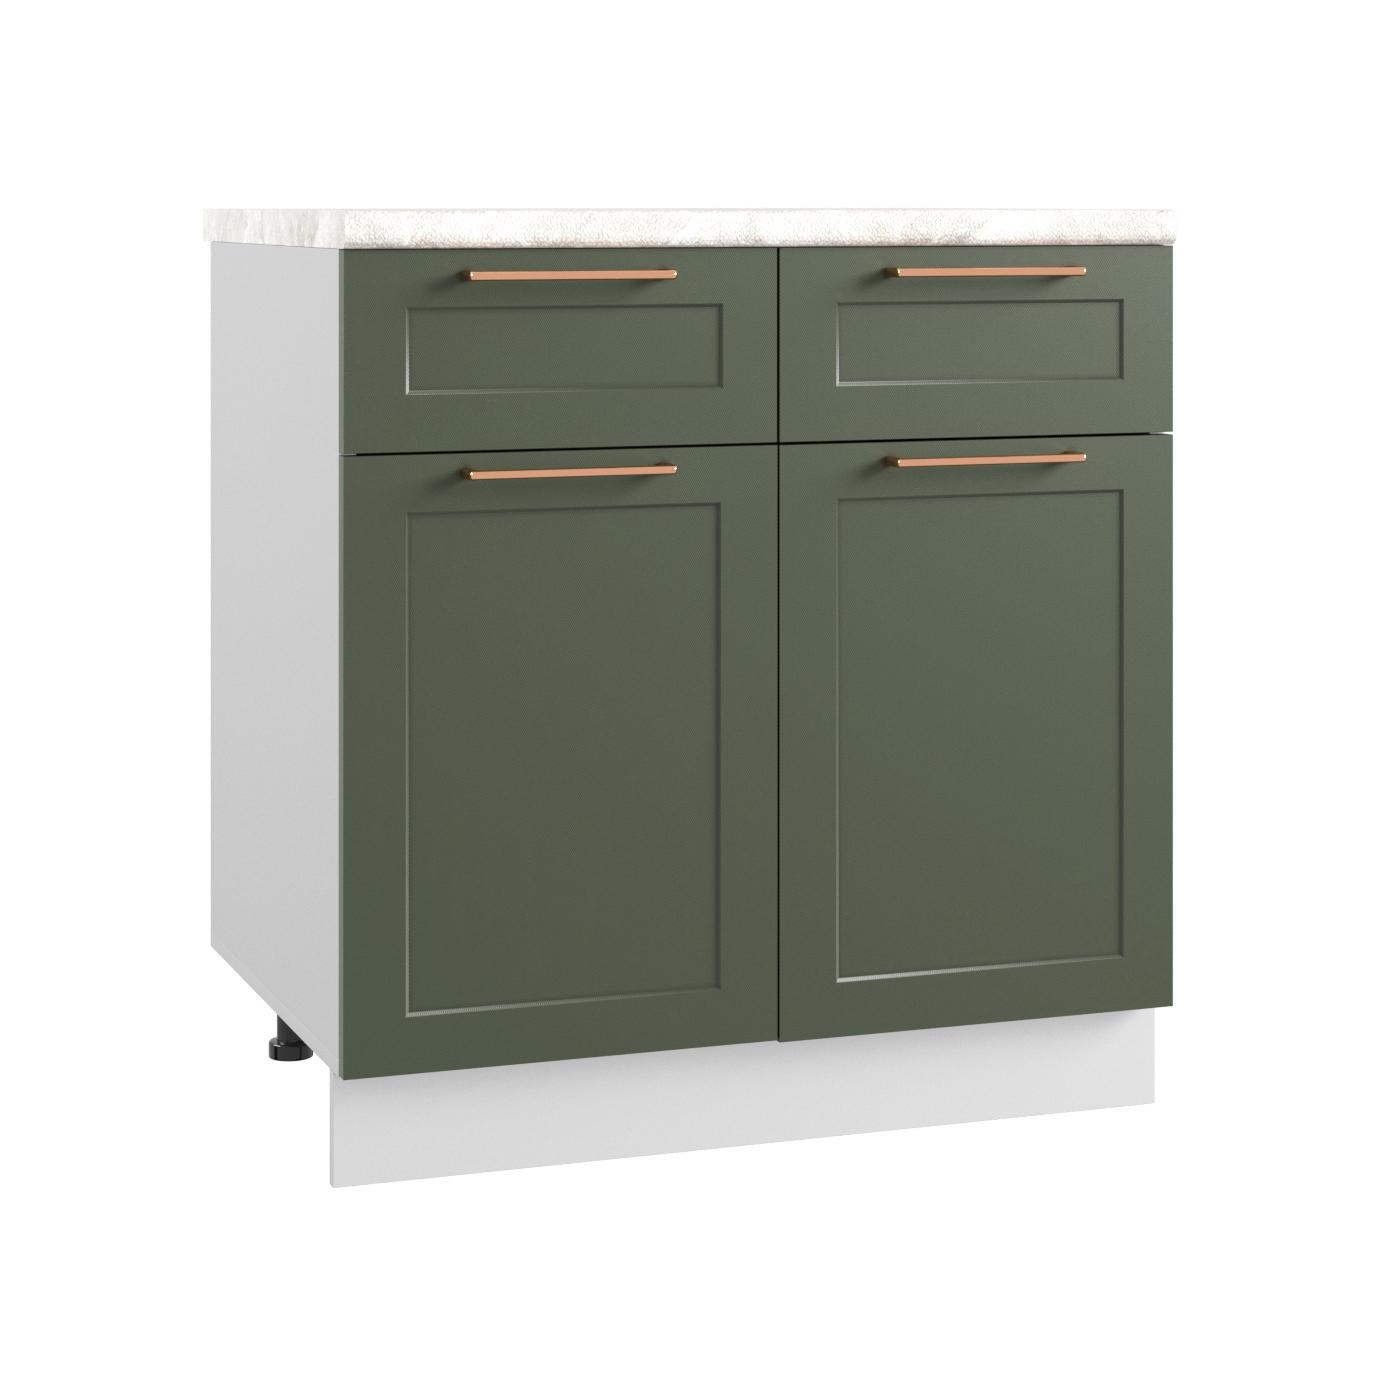 Кухня Квадро С2Я 800 Шкаф нижний с ящиками